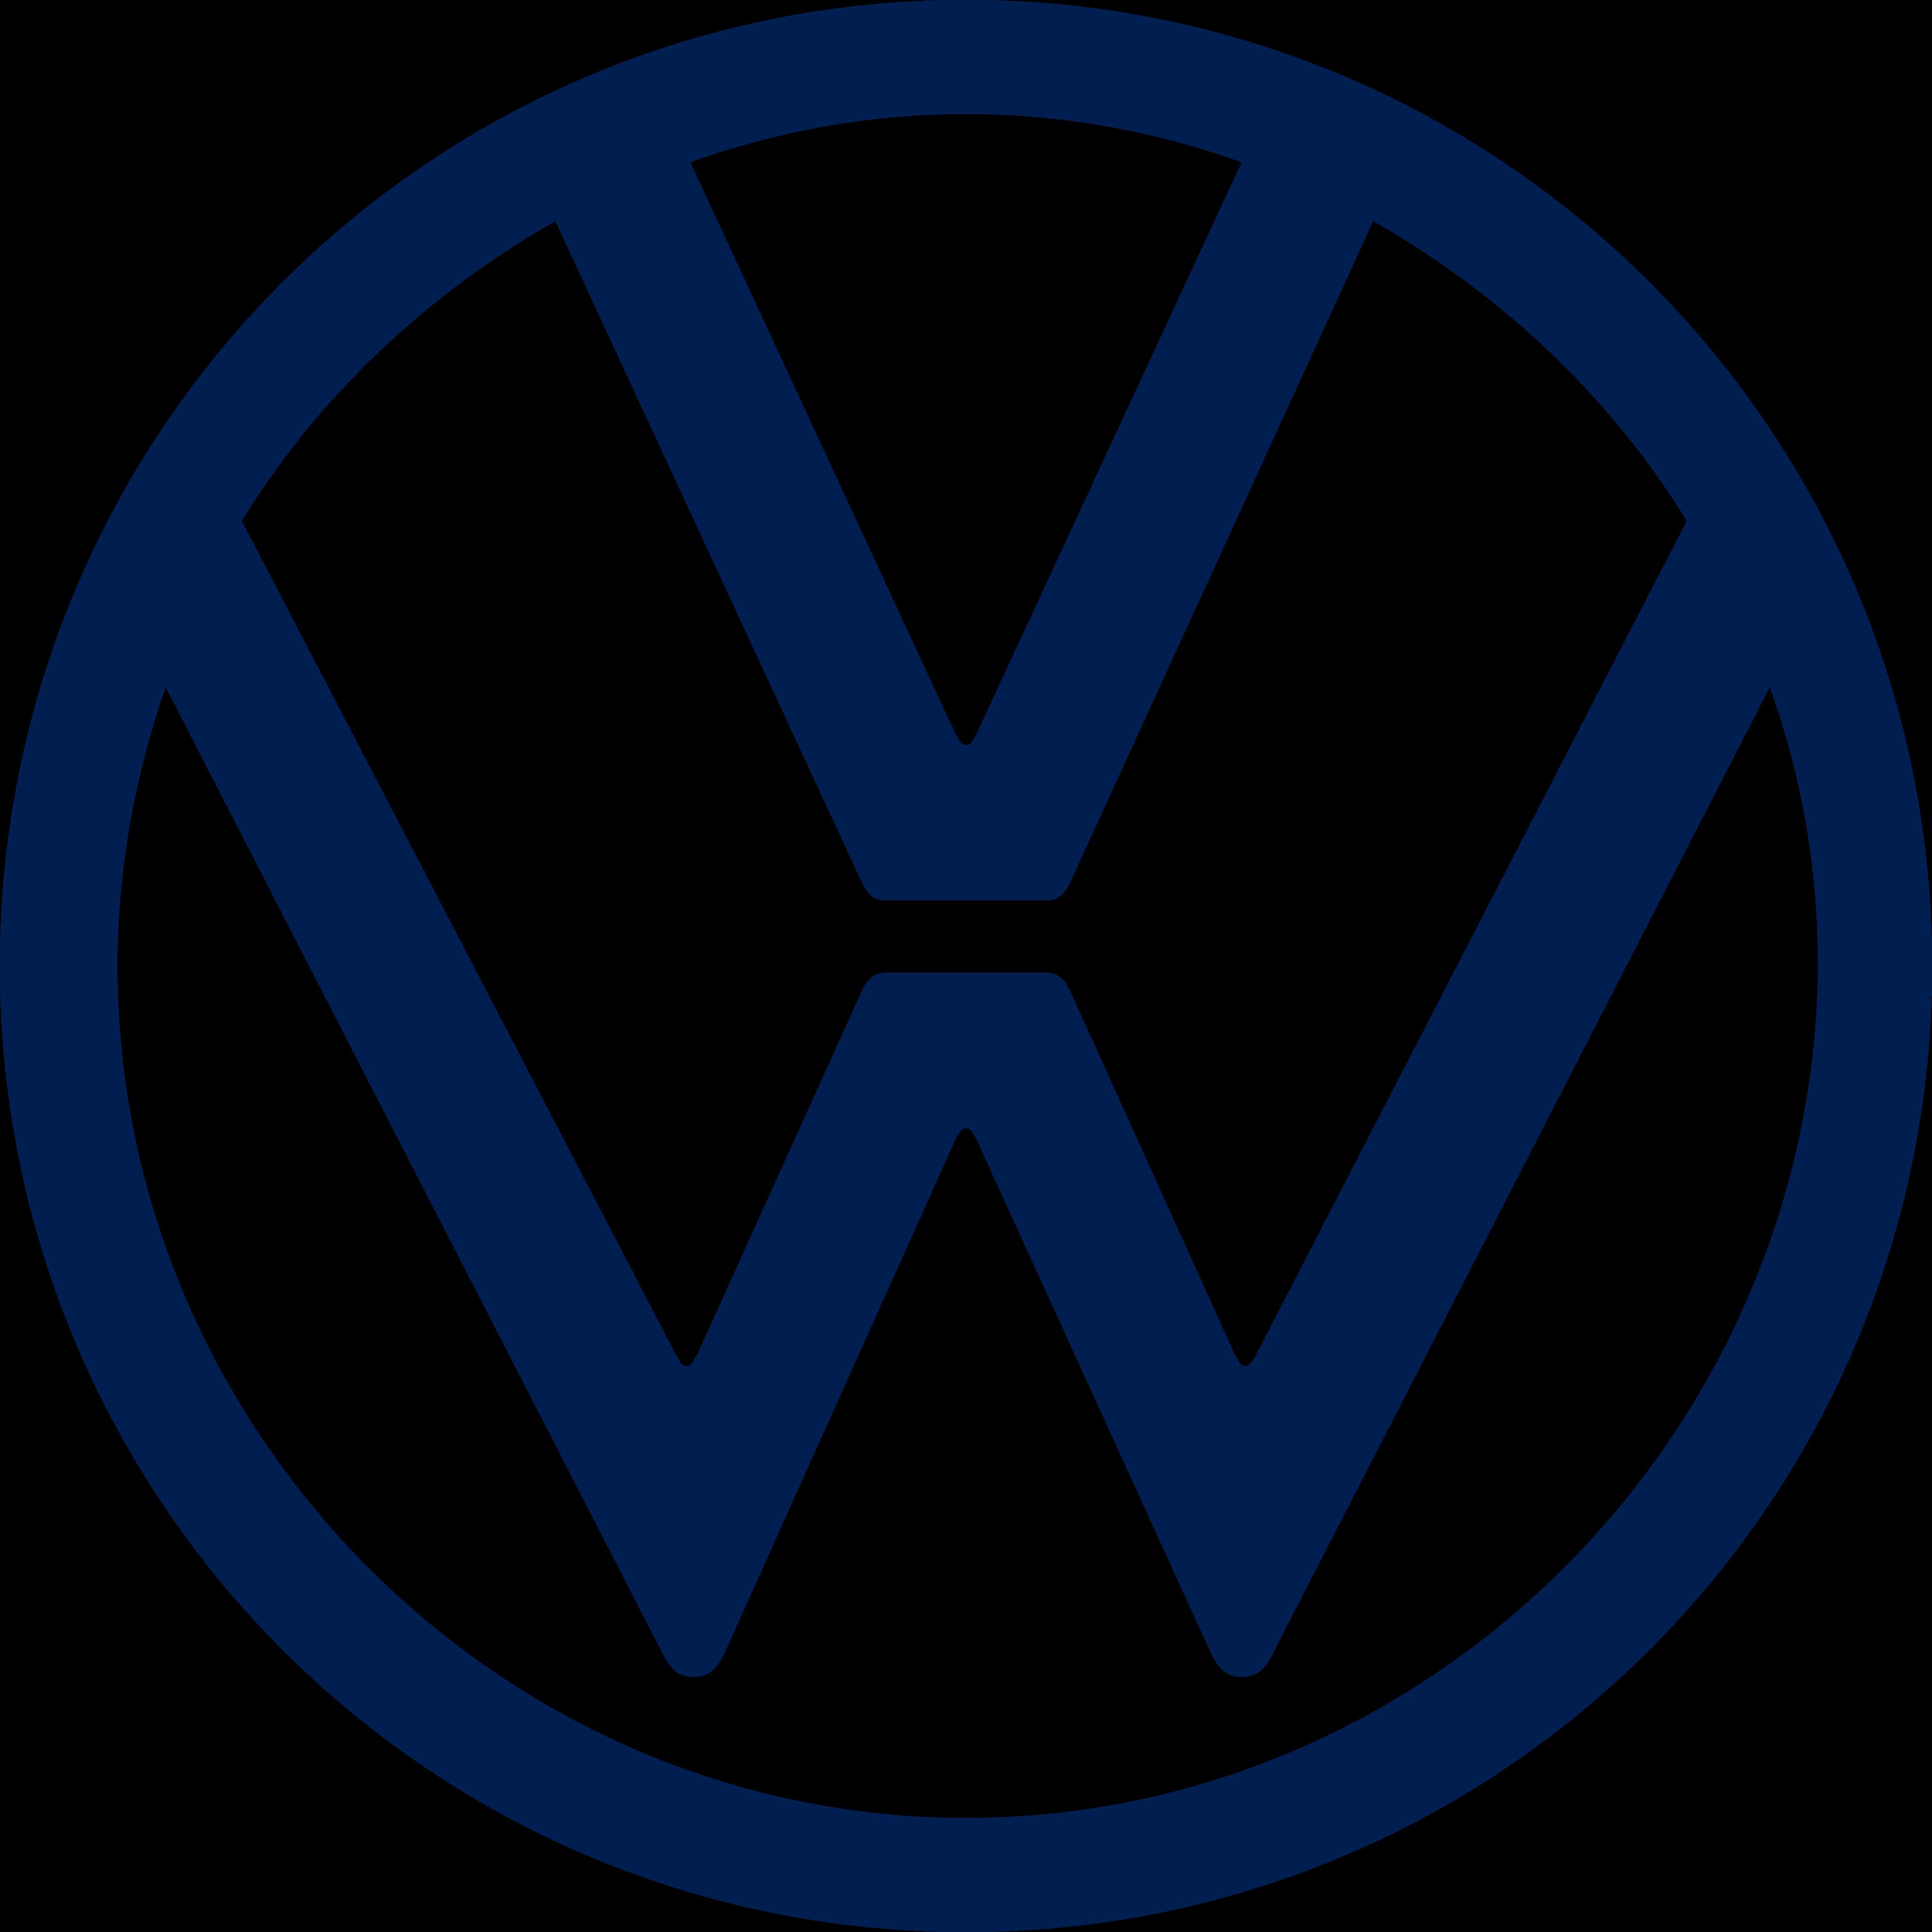 volkswagen vw logo 16 - Volkswagen Logo - VW Logo